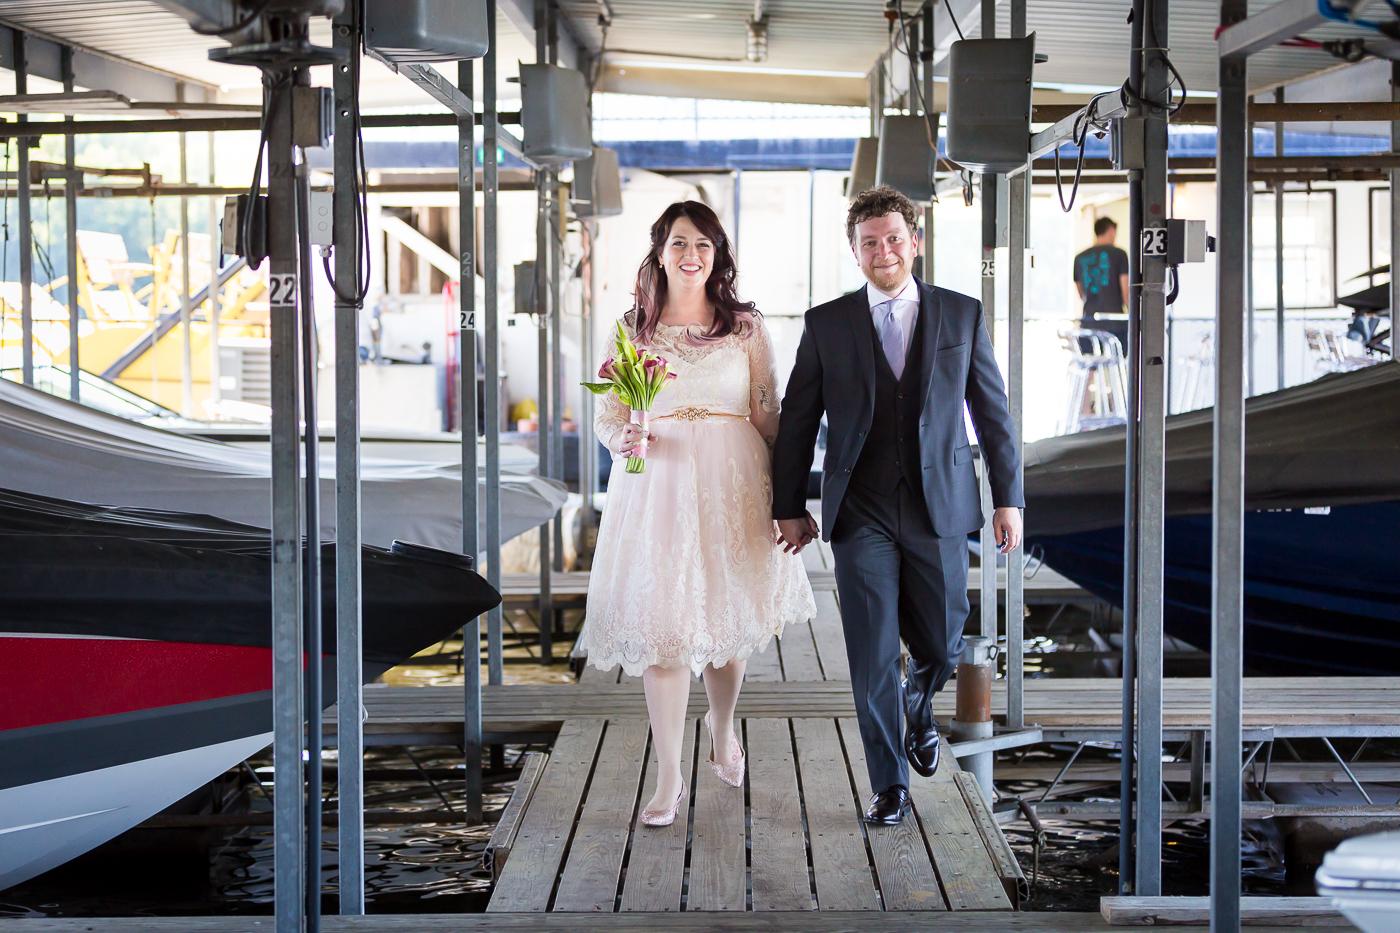 lake-austin-riverboats-wedding-photographer-04.jpg